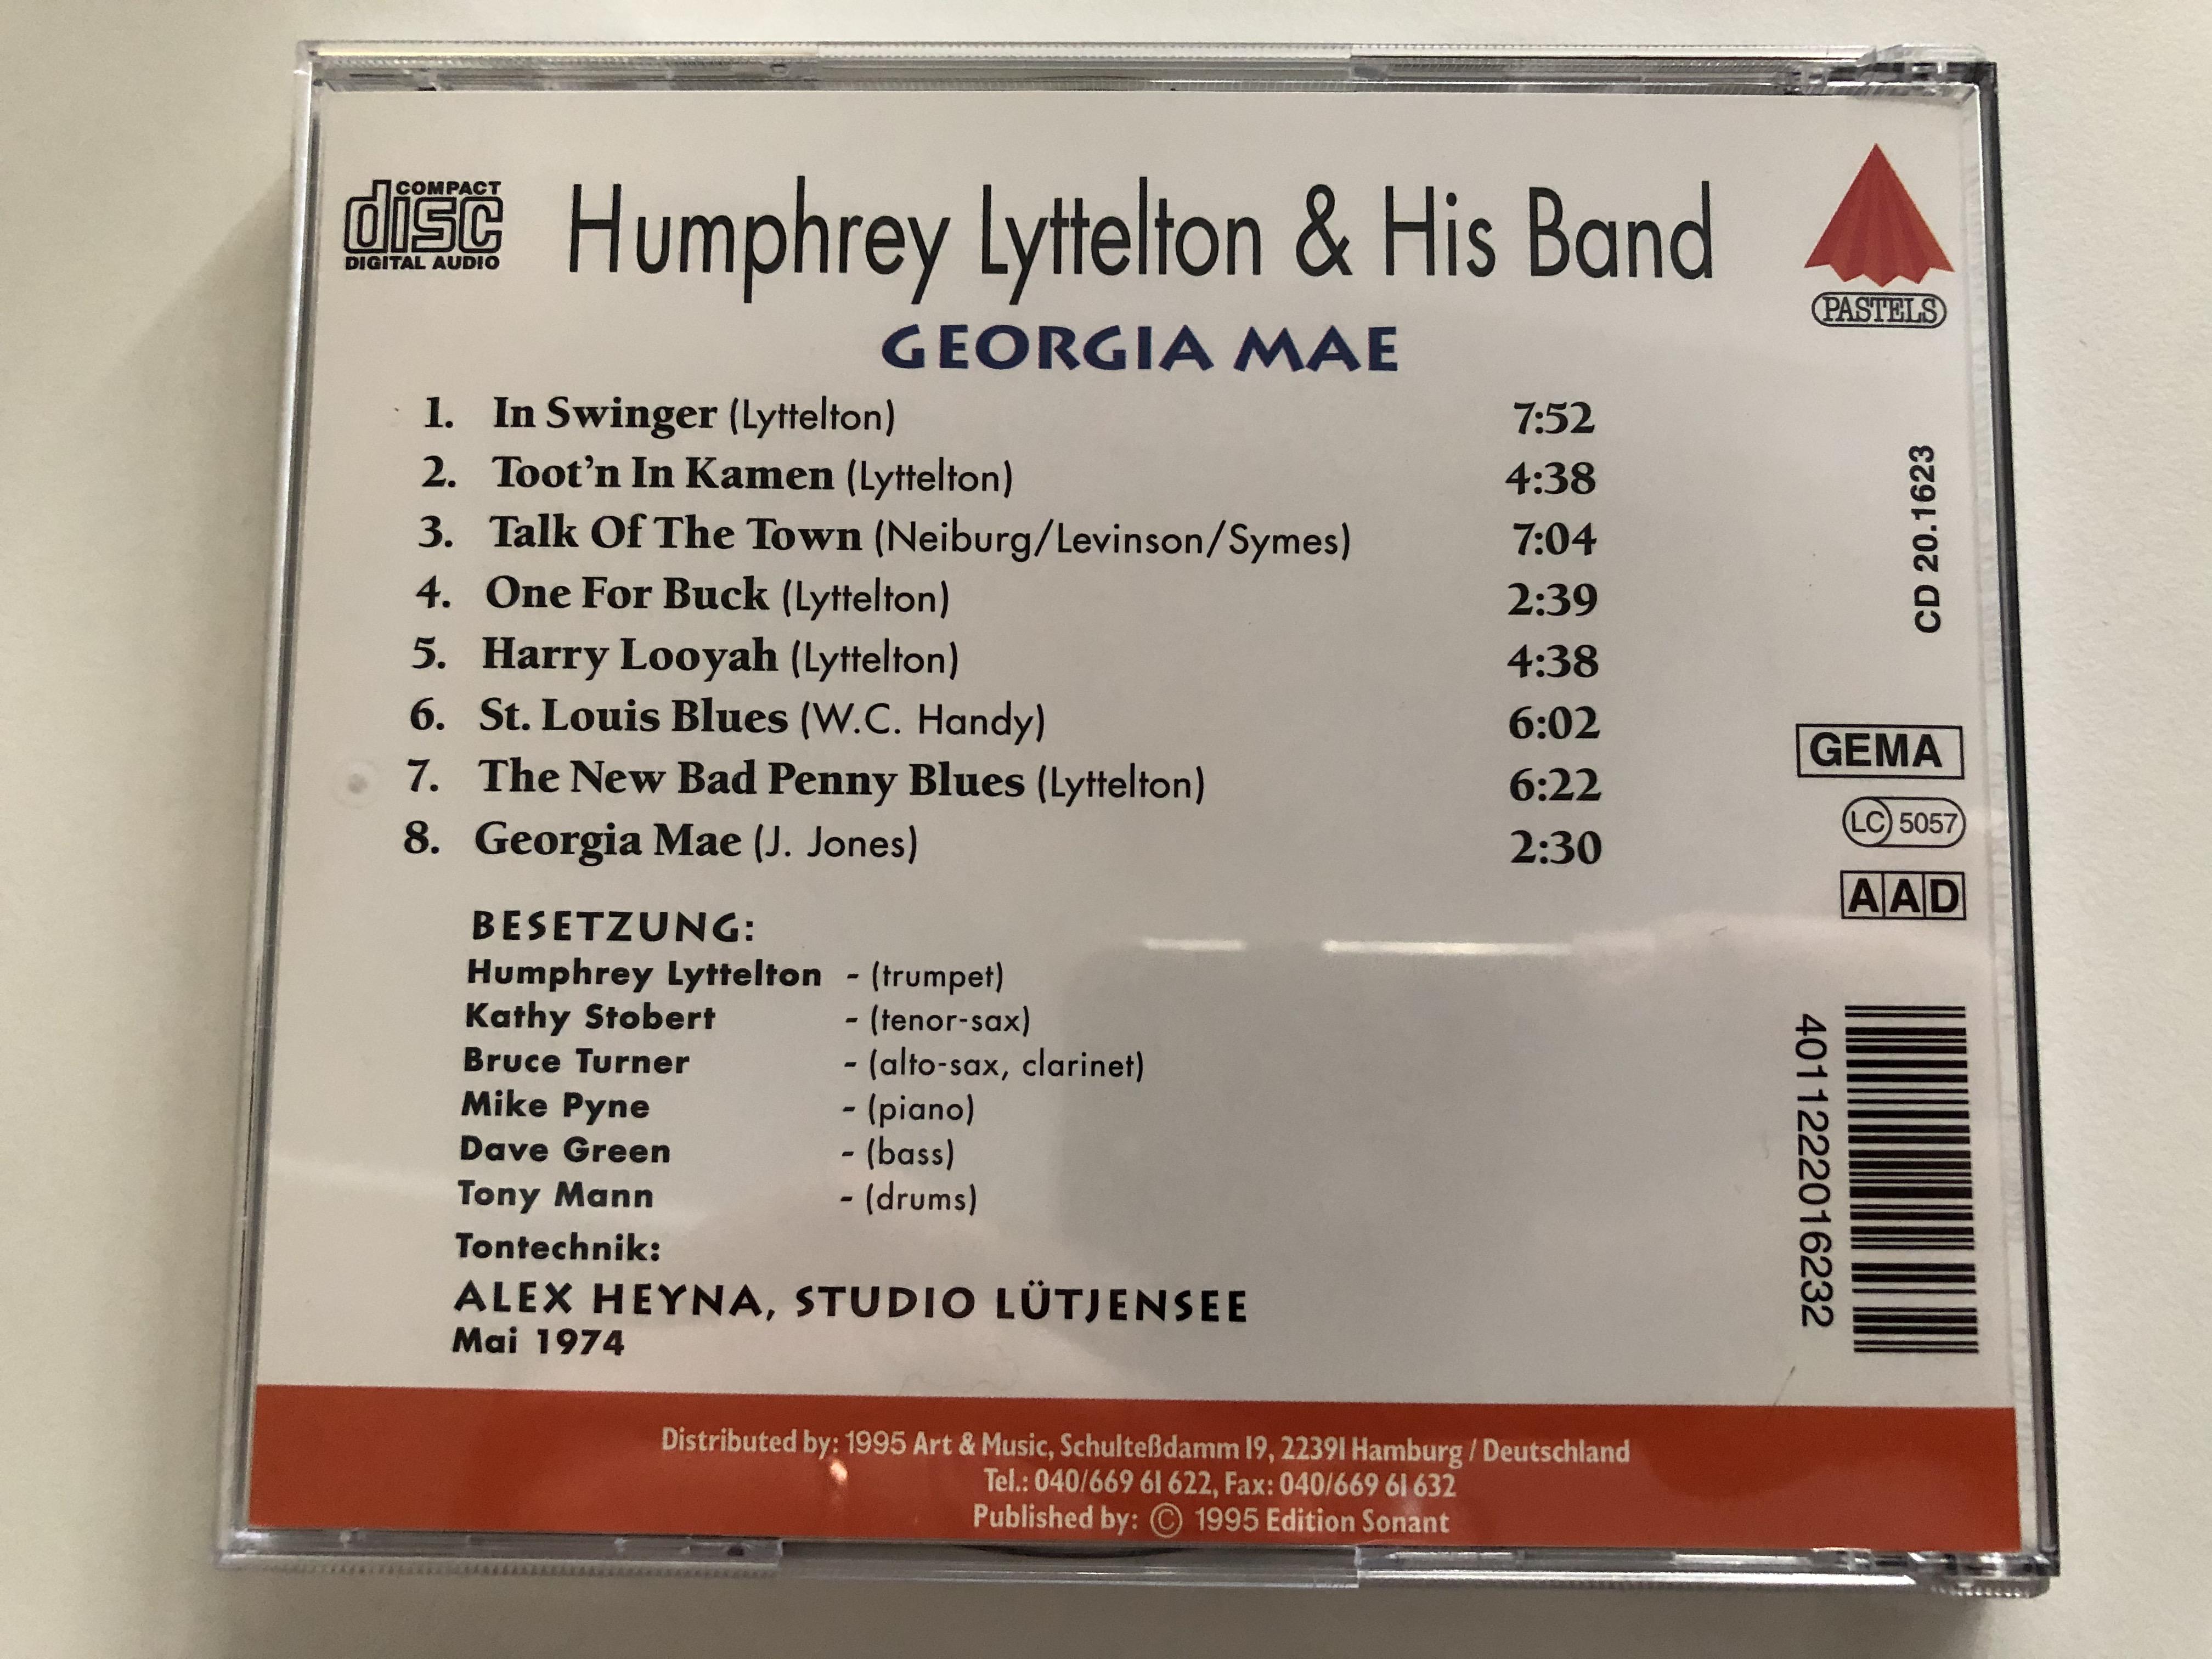 humphrey-lyttelton-his-band-georgia-mae-in-swinger-talk-of-the-town-st.-louis-blues-harry-looyah-u.a.-digital-remastered-jazz-edition-pastels-audio-cd-1995-cd-20-4-.jpg